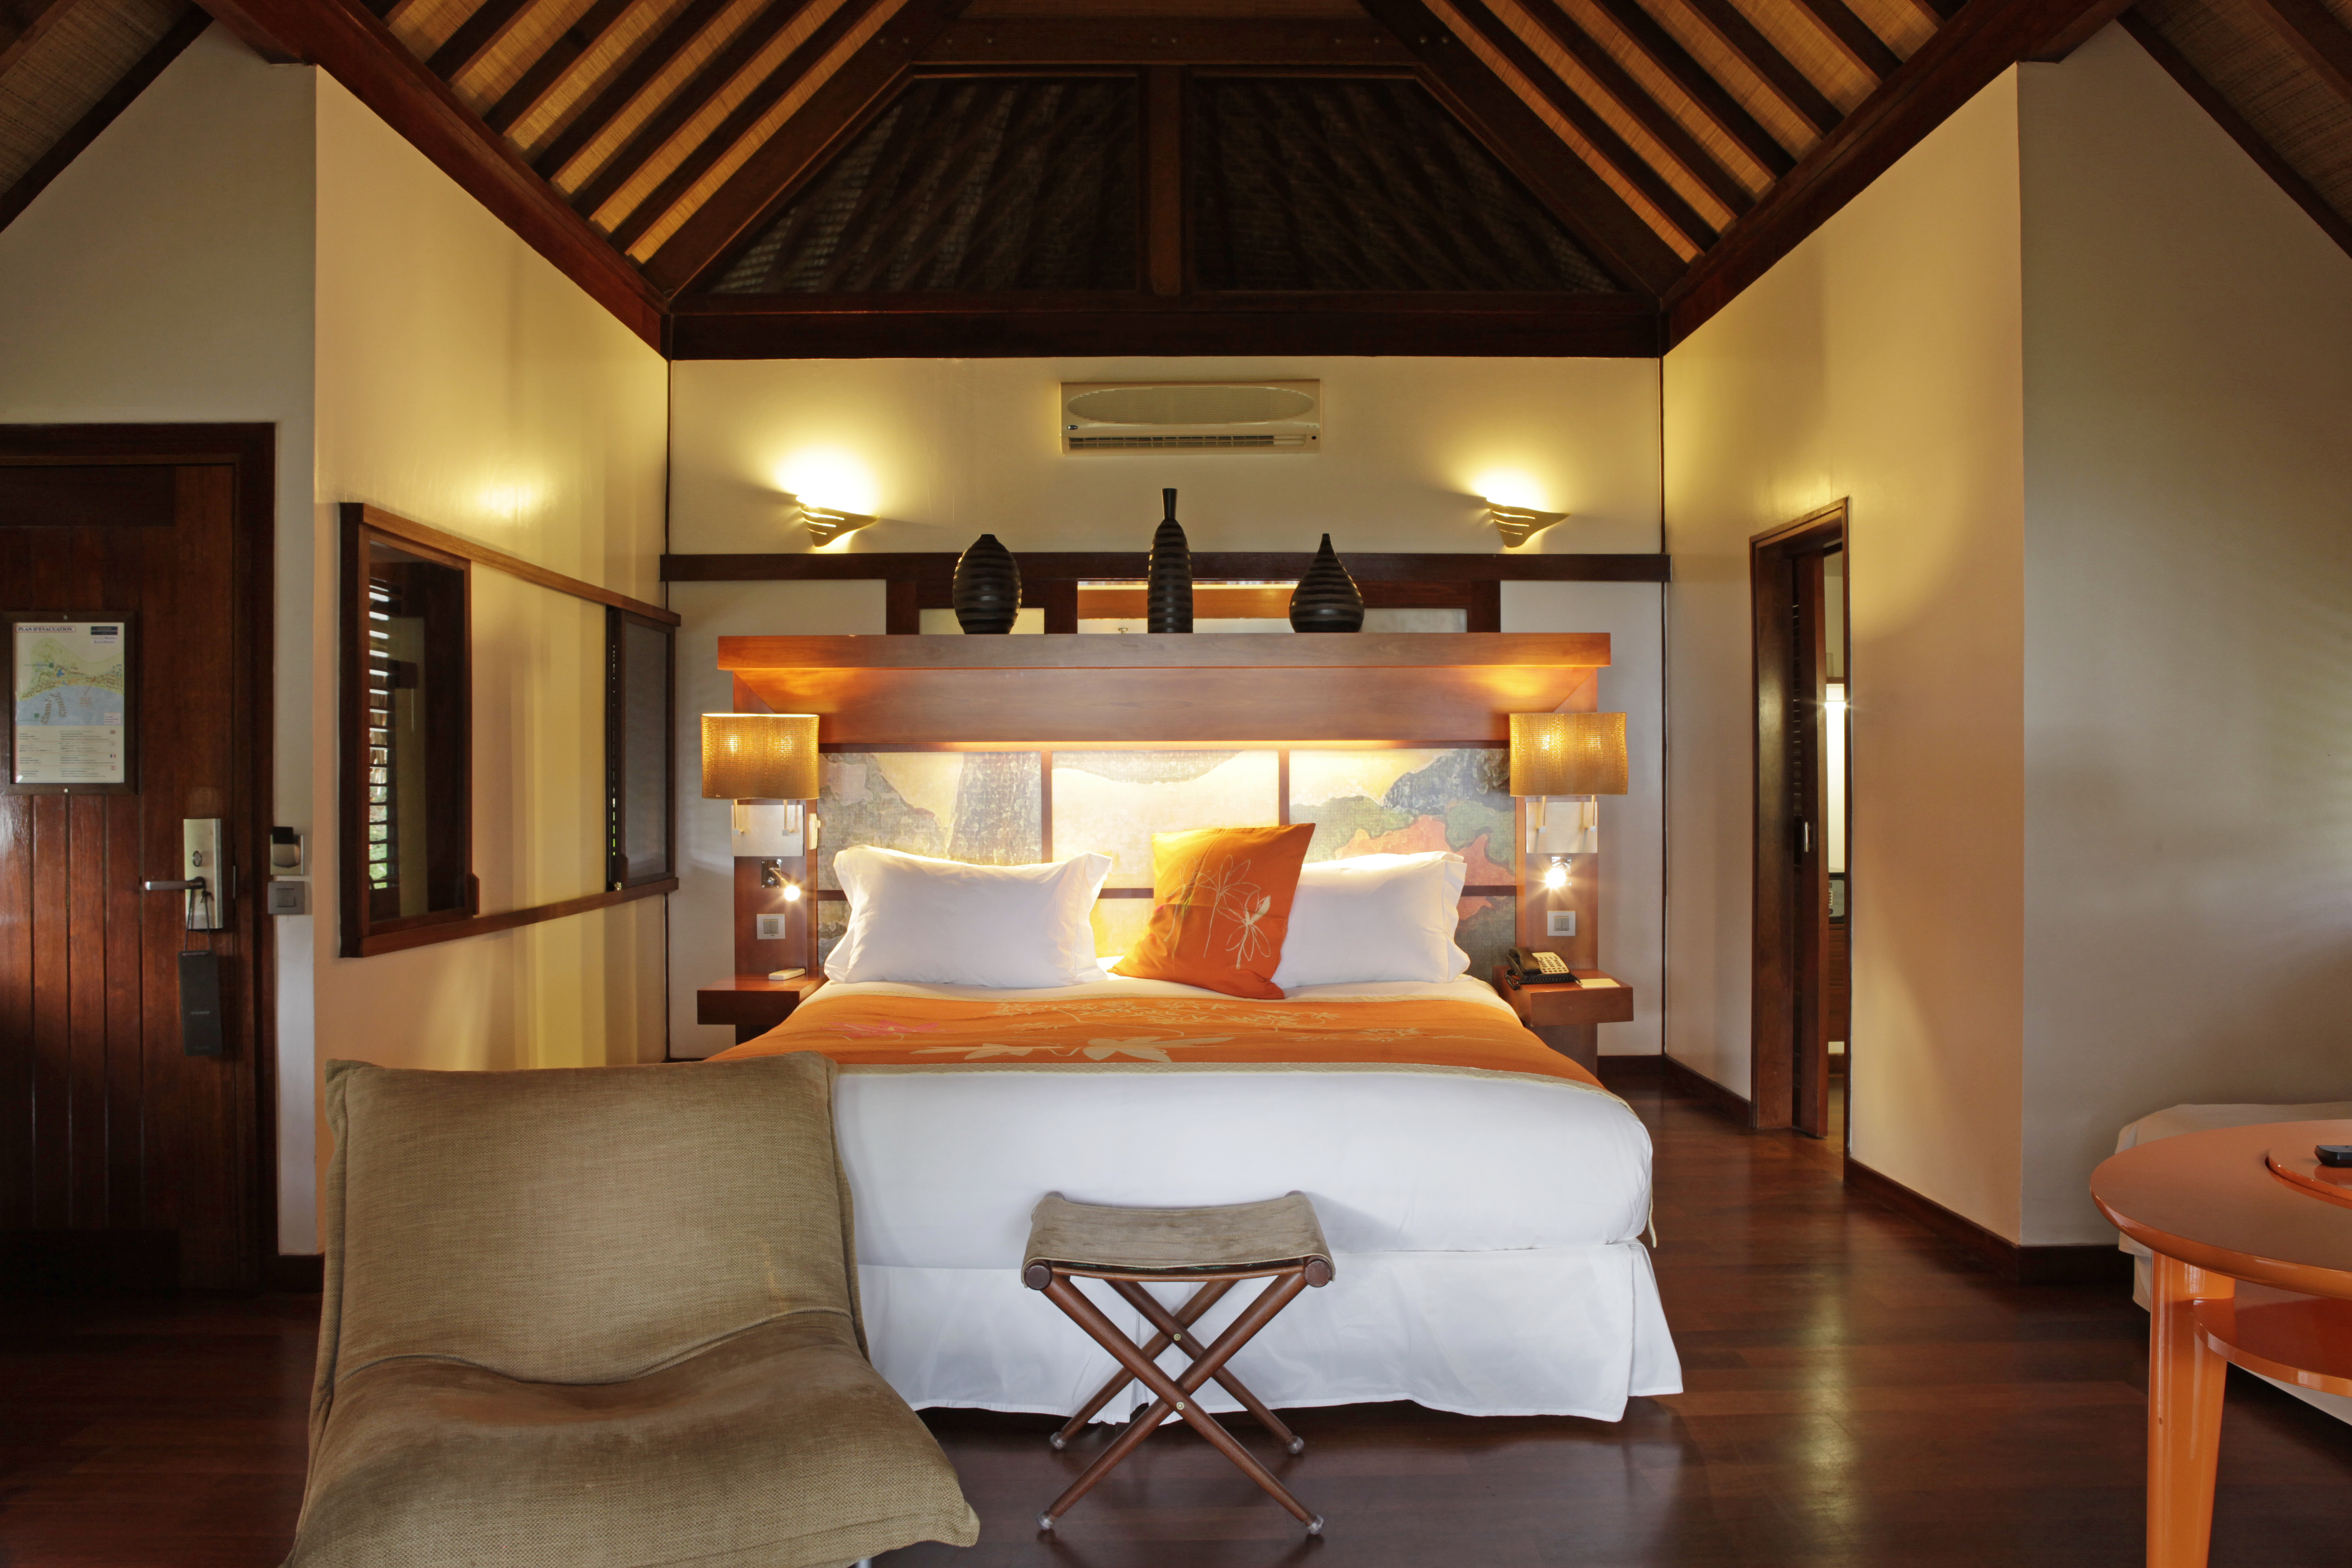 https://tahititourisme.com/wp-content/uploads/2017/11/MOZ-Sofitel-Moorea-Luxury-GDN-Bungalows-Interior.jpg